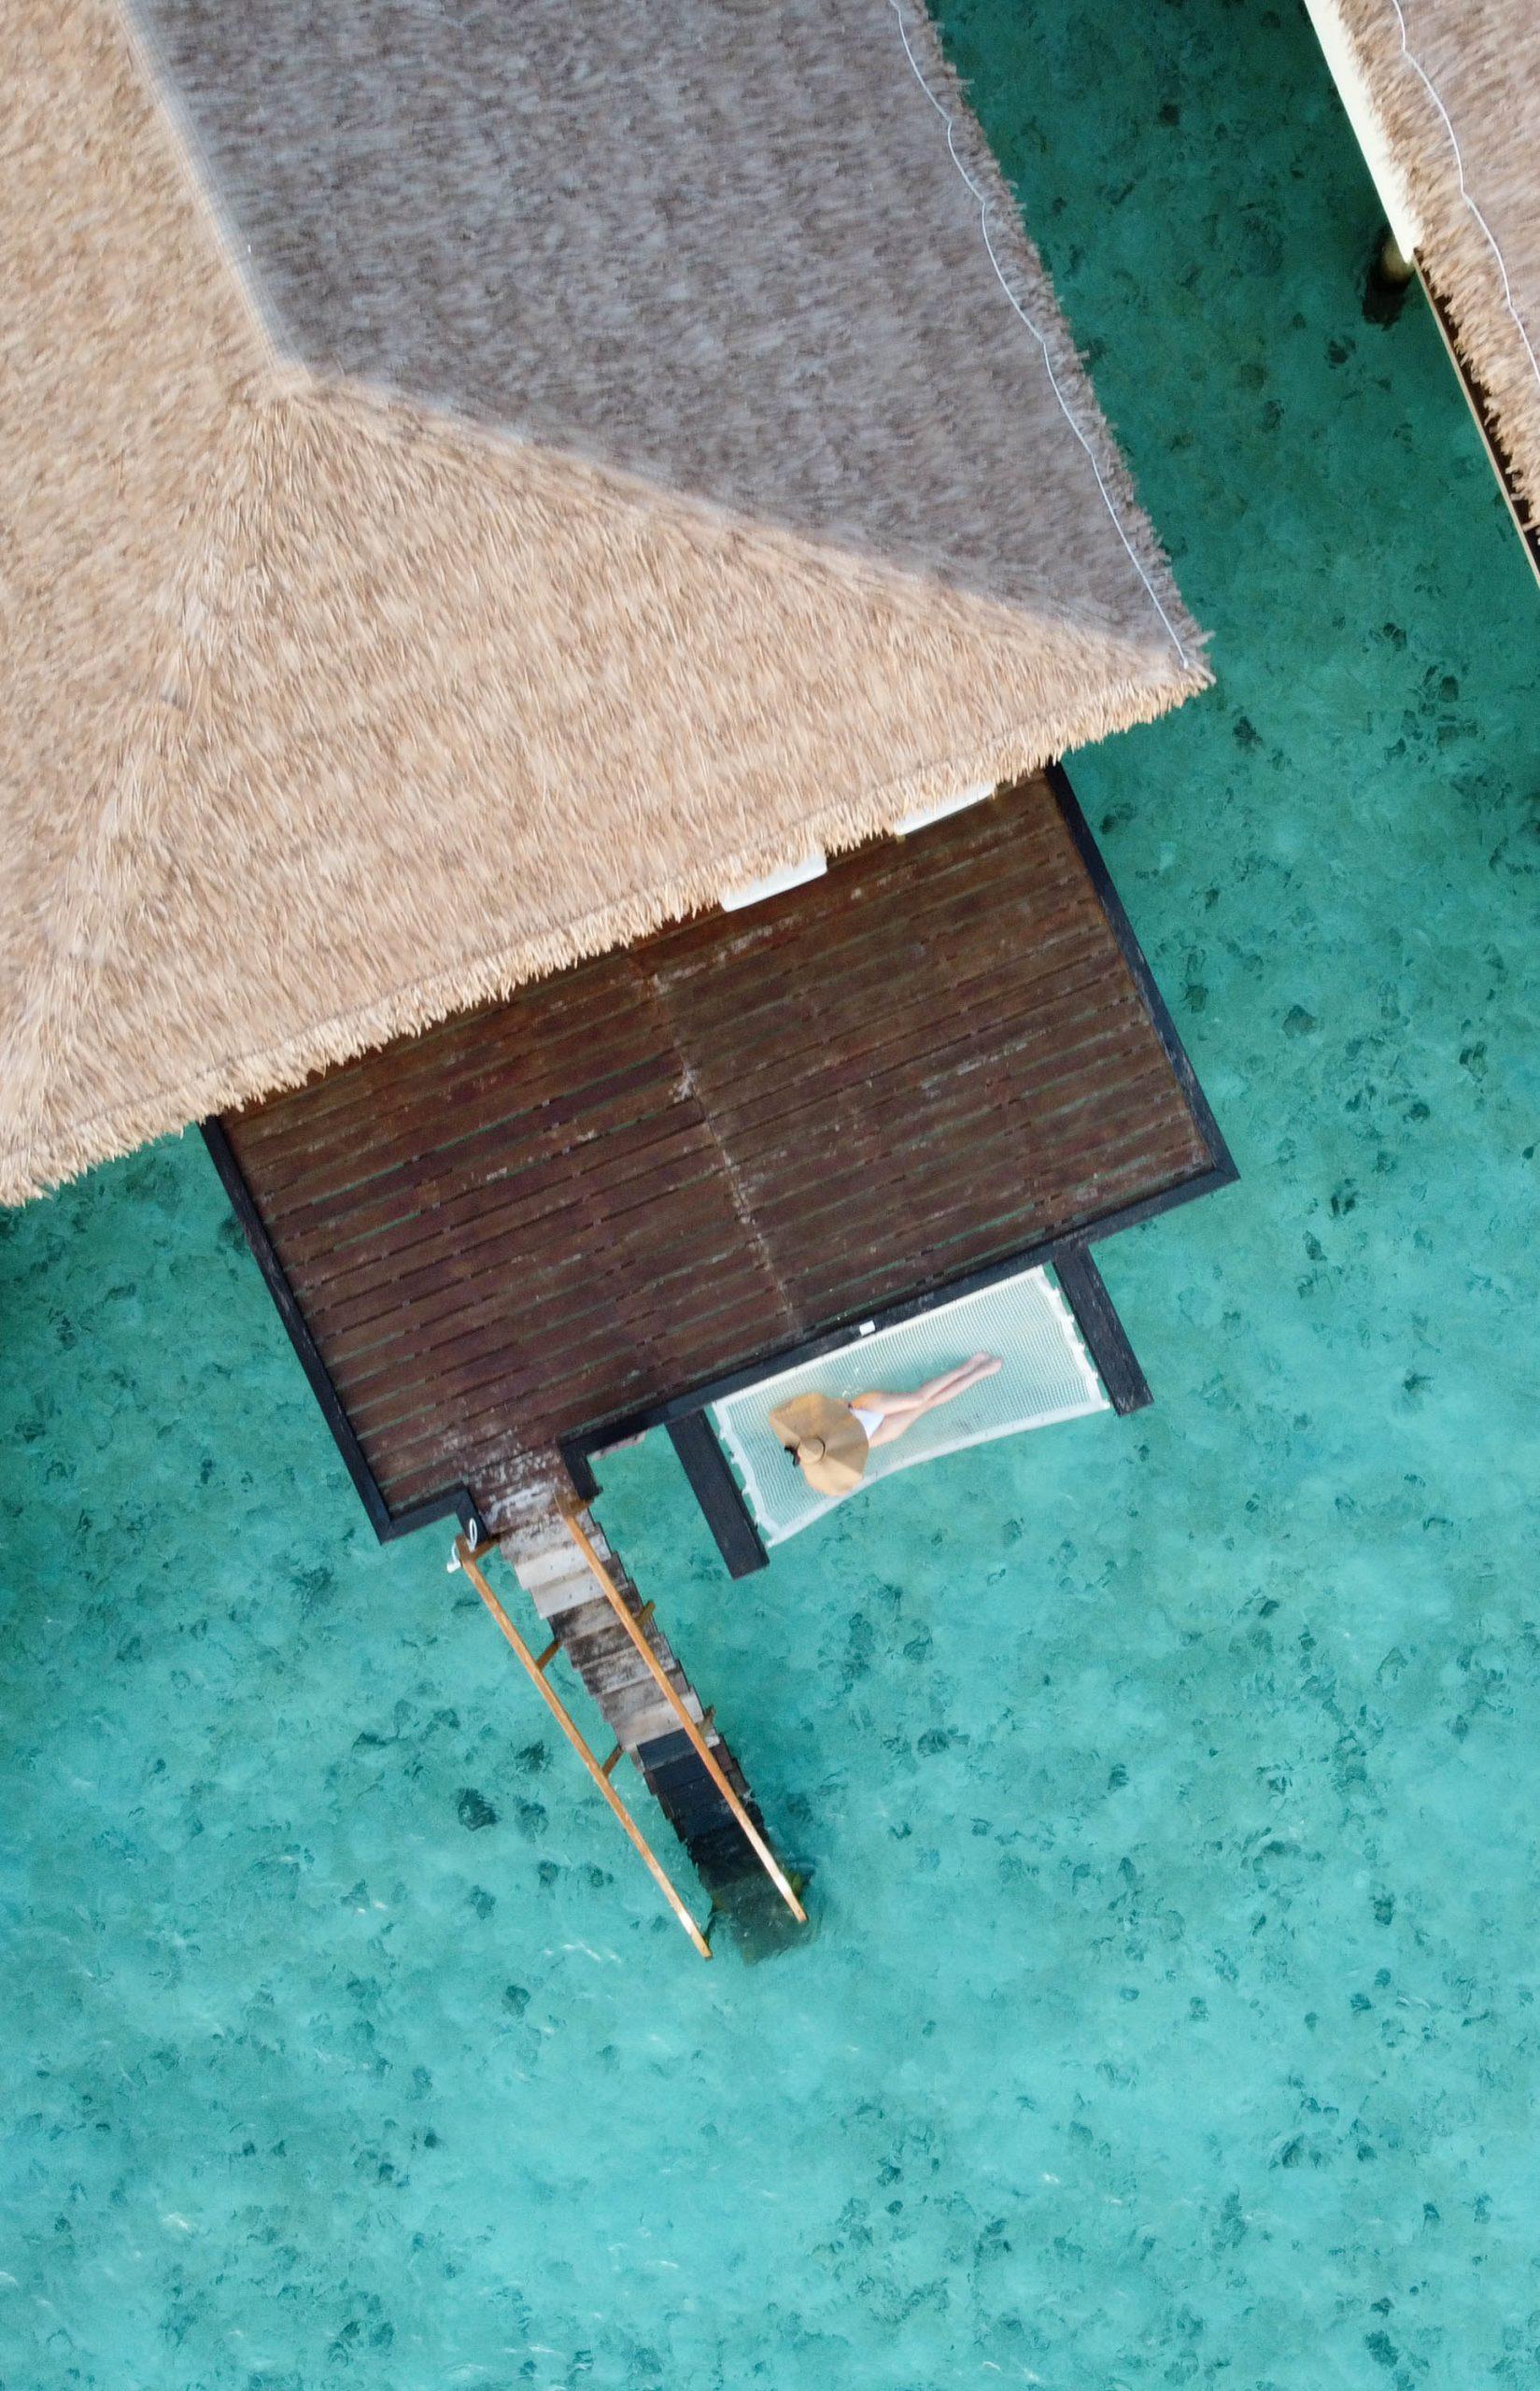 cinnamon velifushi overwater villa bungalow dron dji mavic mini clear turqoise blue water asia oversized floppy sun hat woman laying down